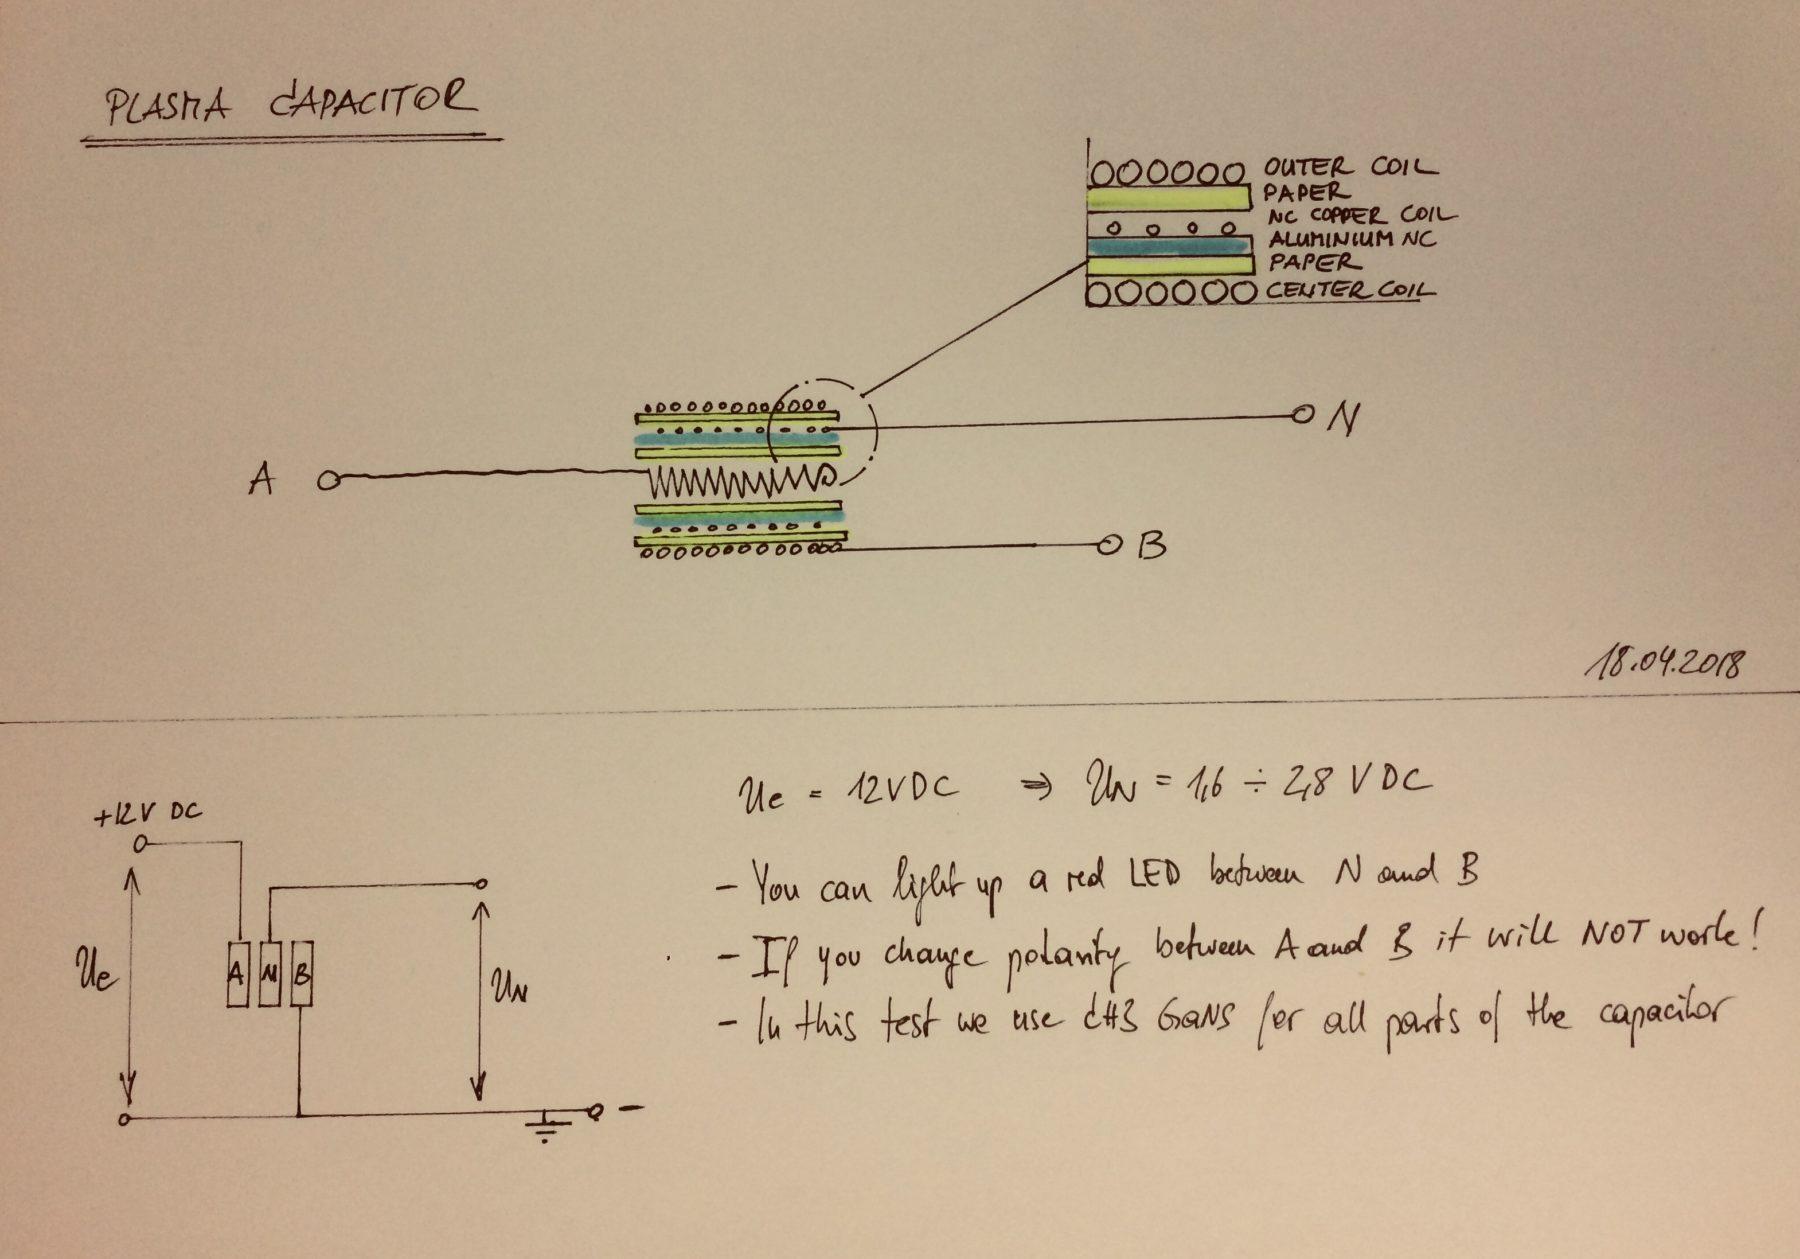 plasma capacitor ANB draft